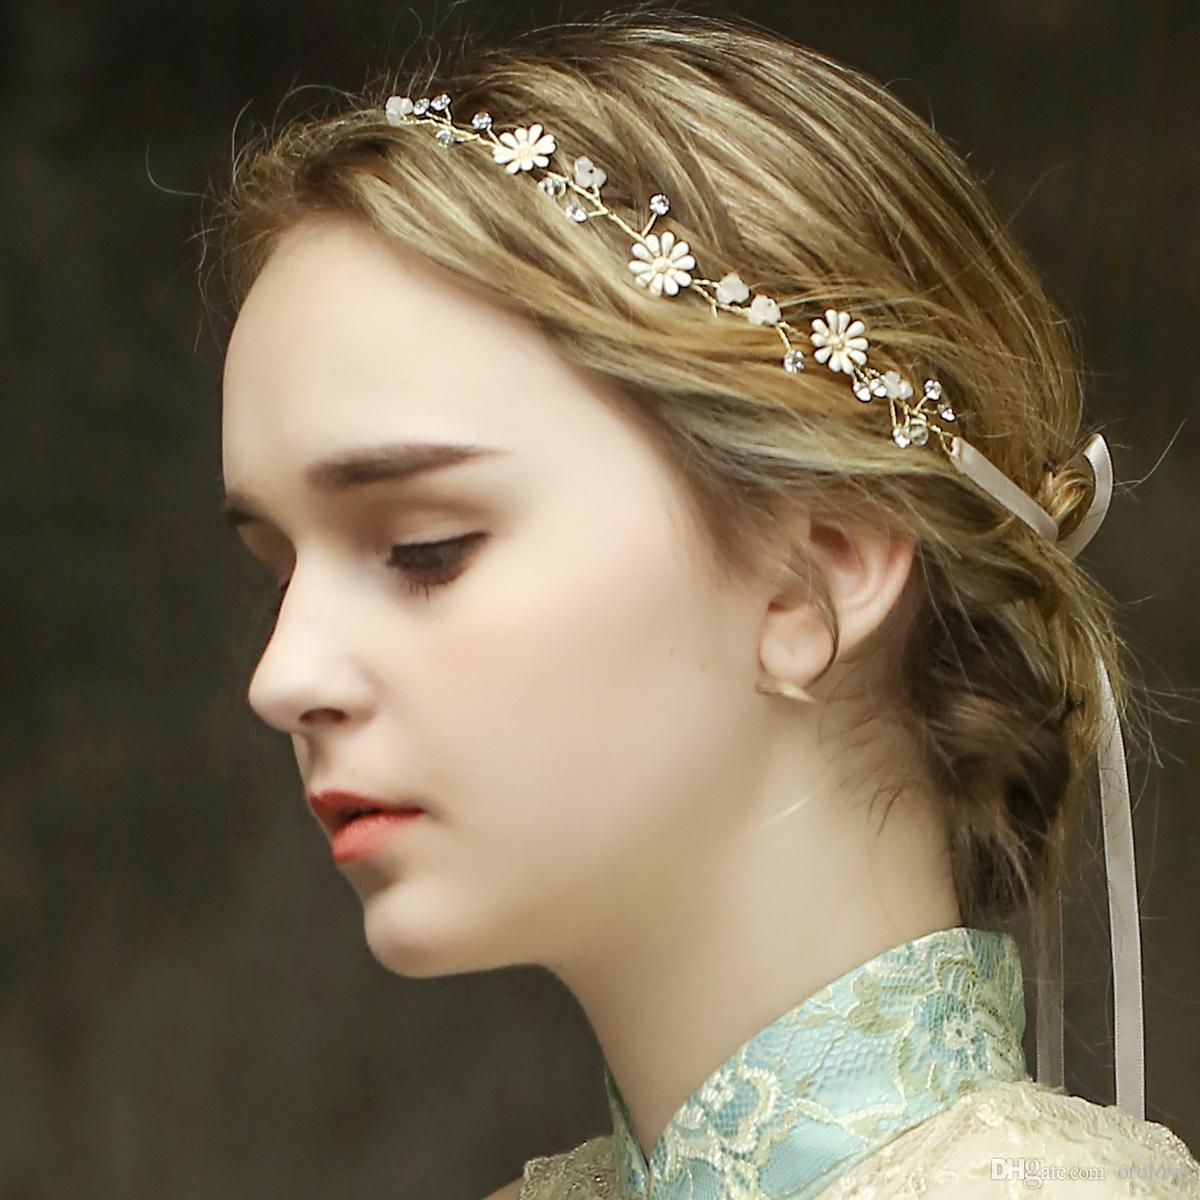 Grosshandel Einfache Blumen Haar Rebe Braut Kopfschmuck